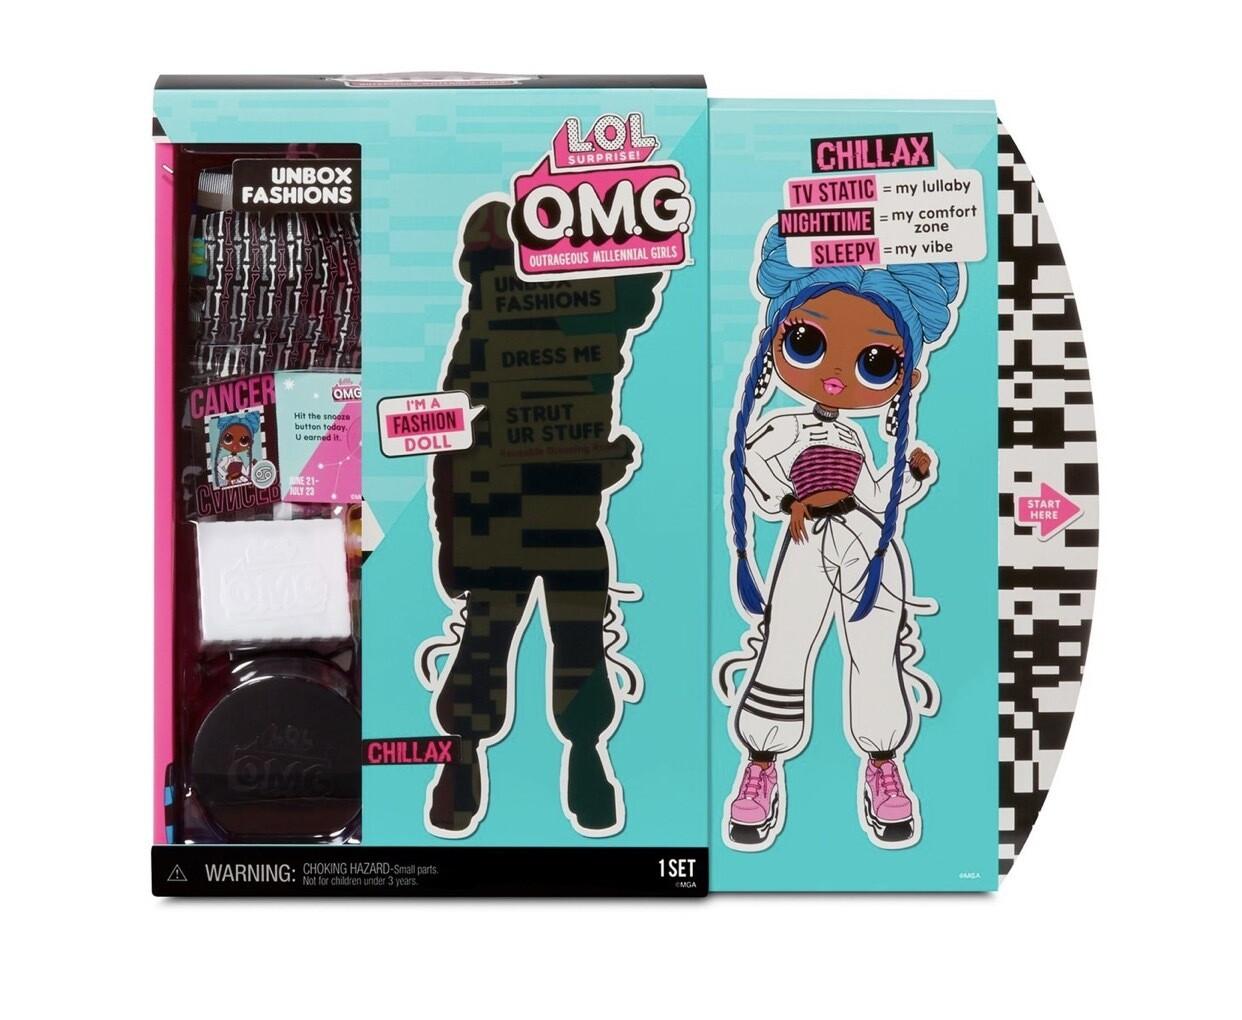 L.O.L. Surprise! O.M.G. Series 3 Chillax Fashion Doll